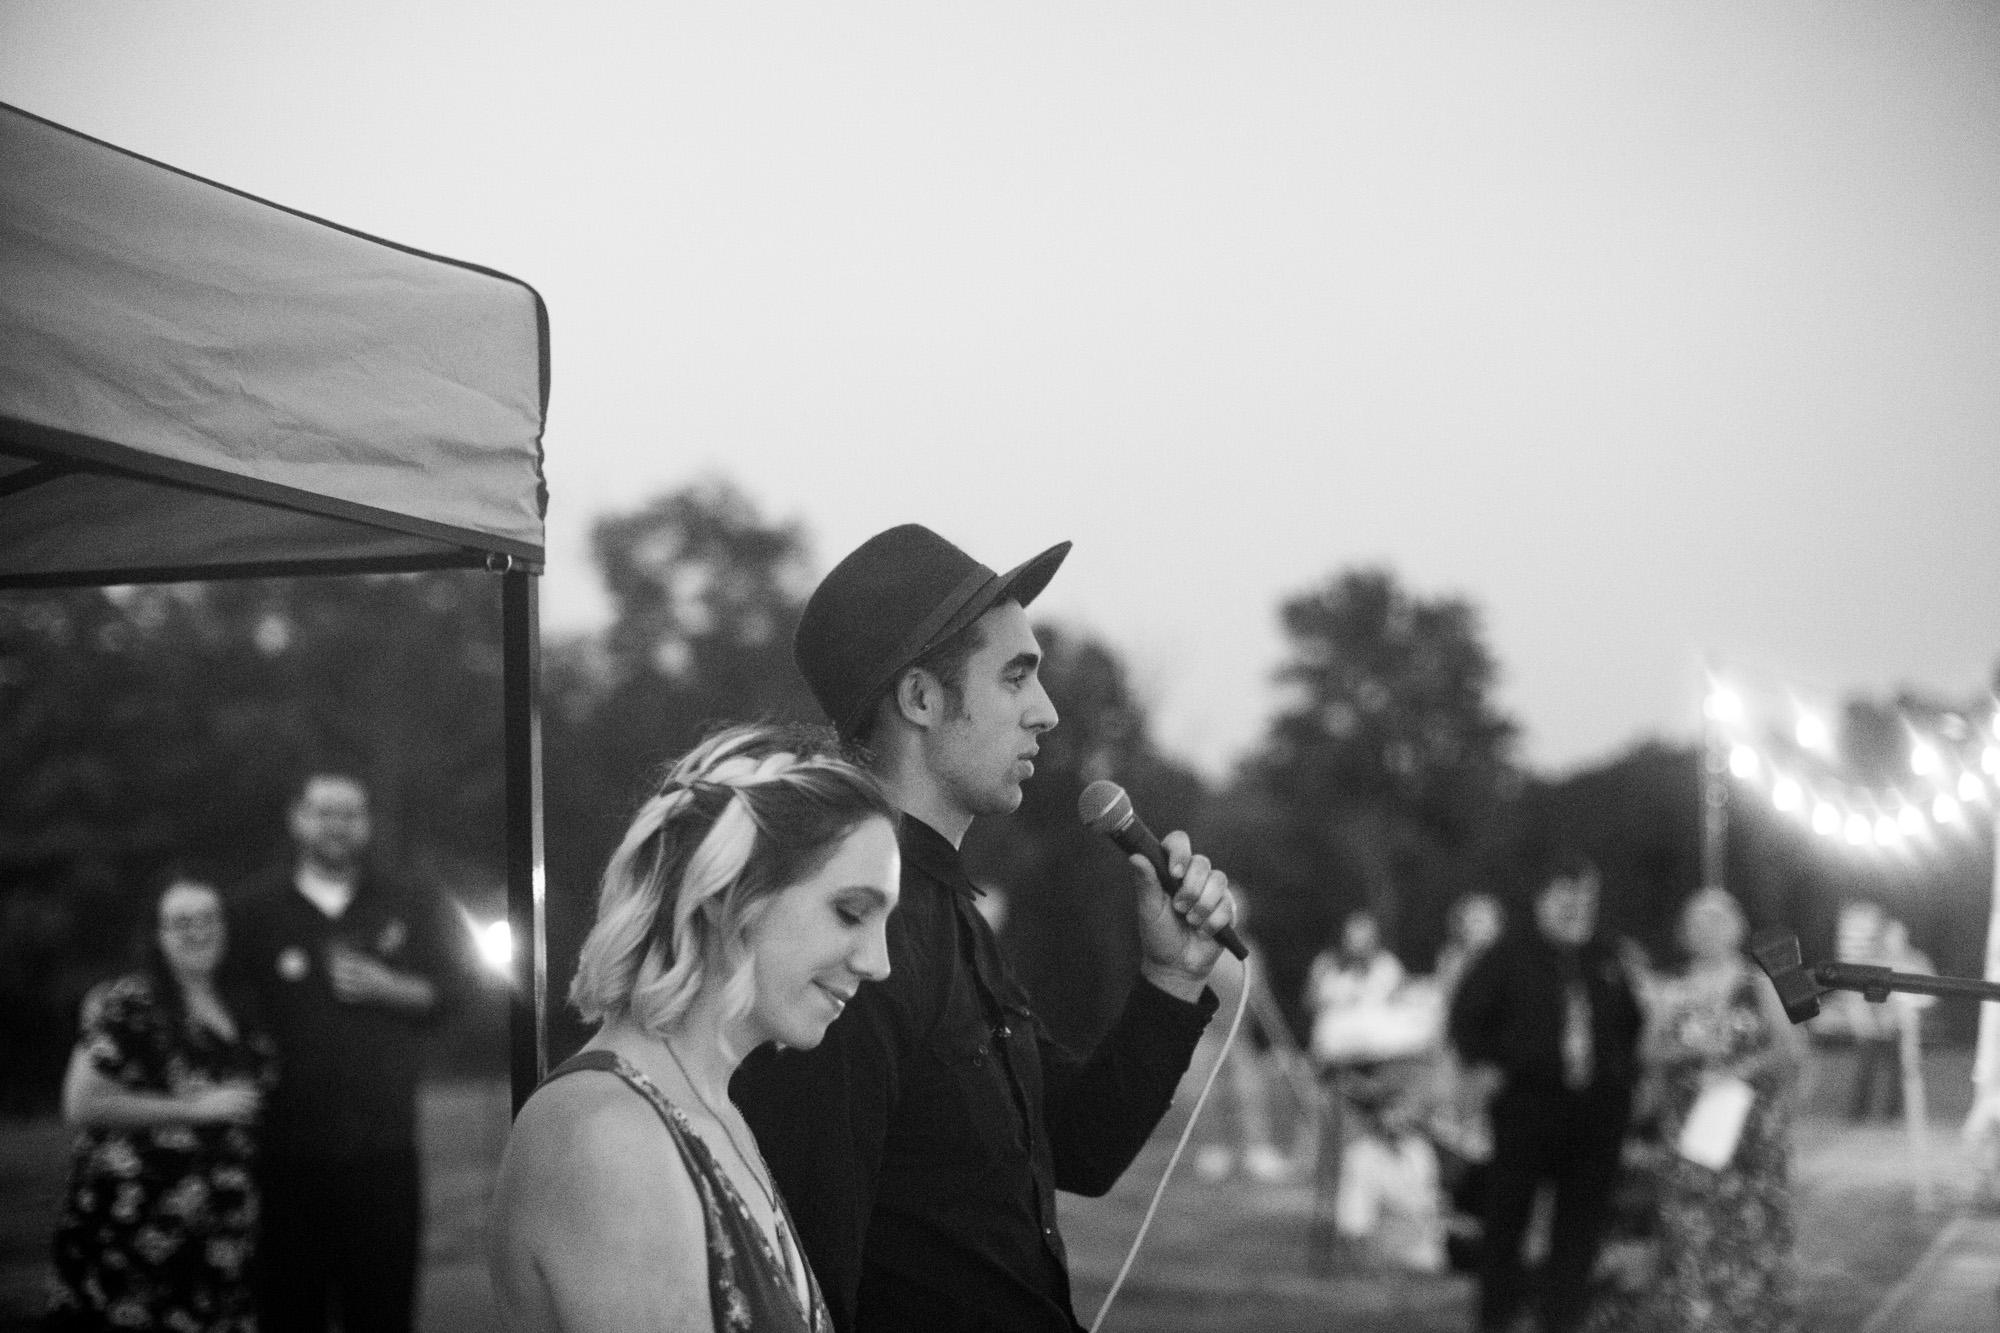 Seriously_Sabrina_Photography_Red_River_Gorge_Kentucky_Wedding_ShawnDana204.jpg